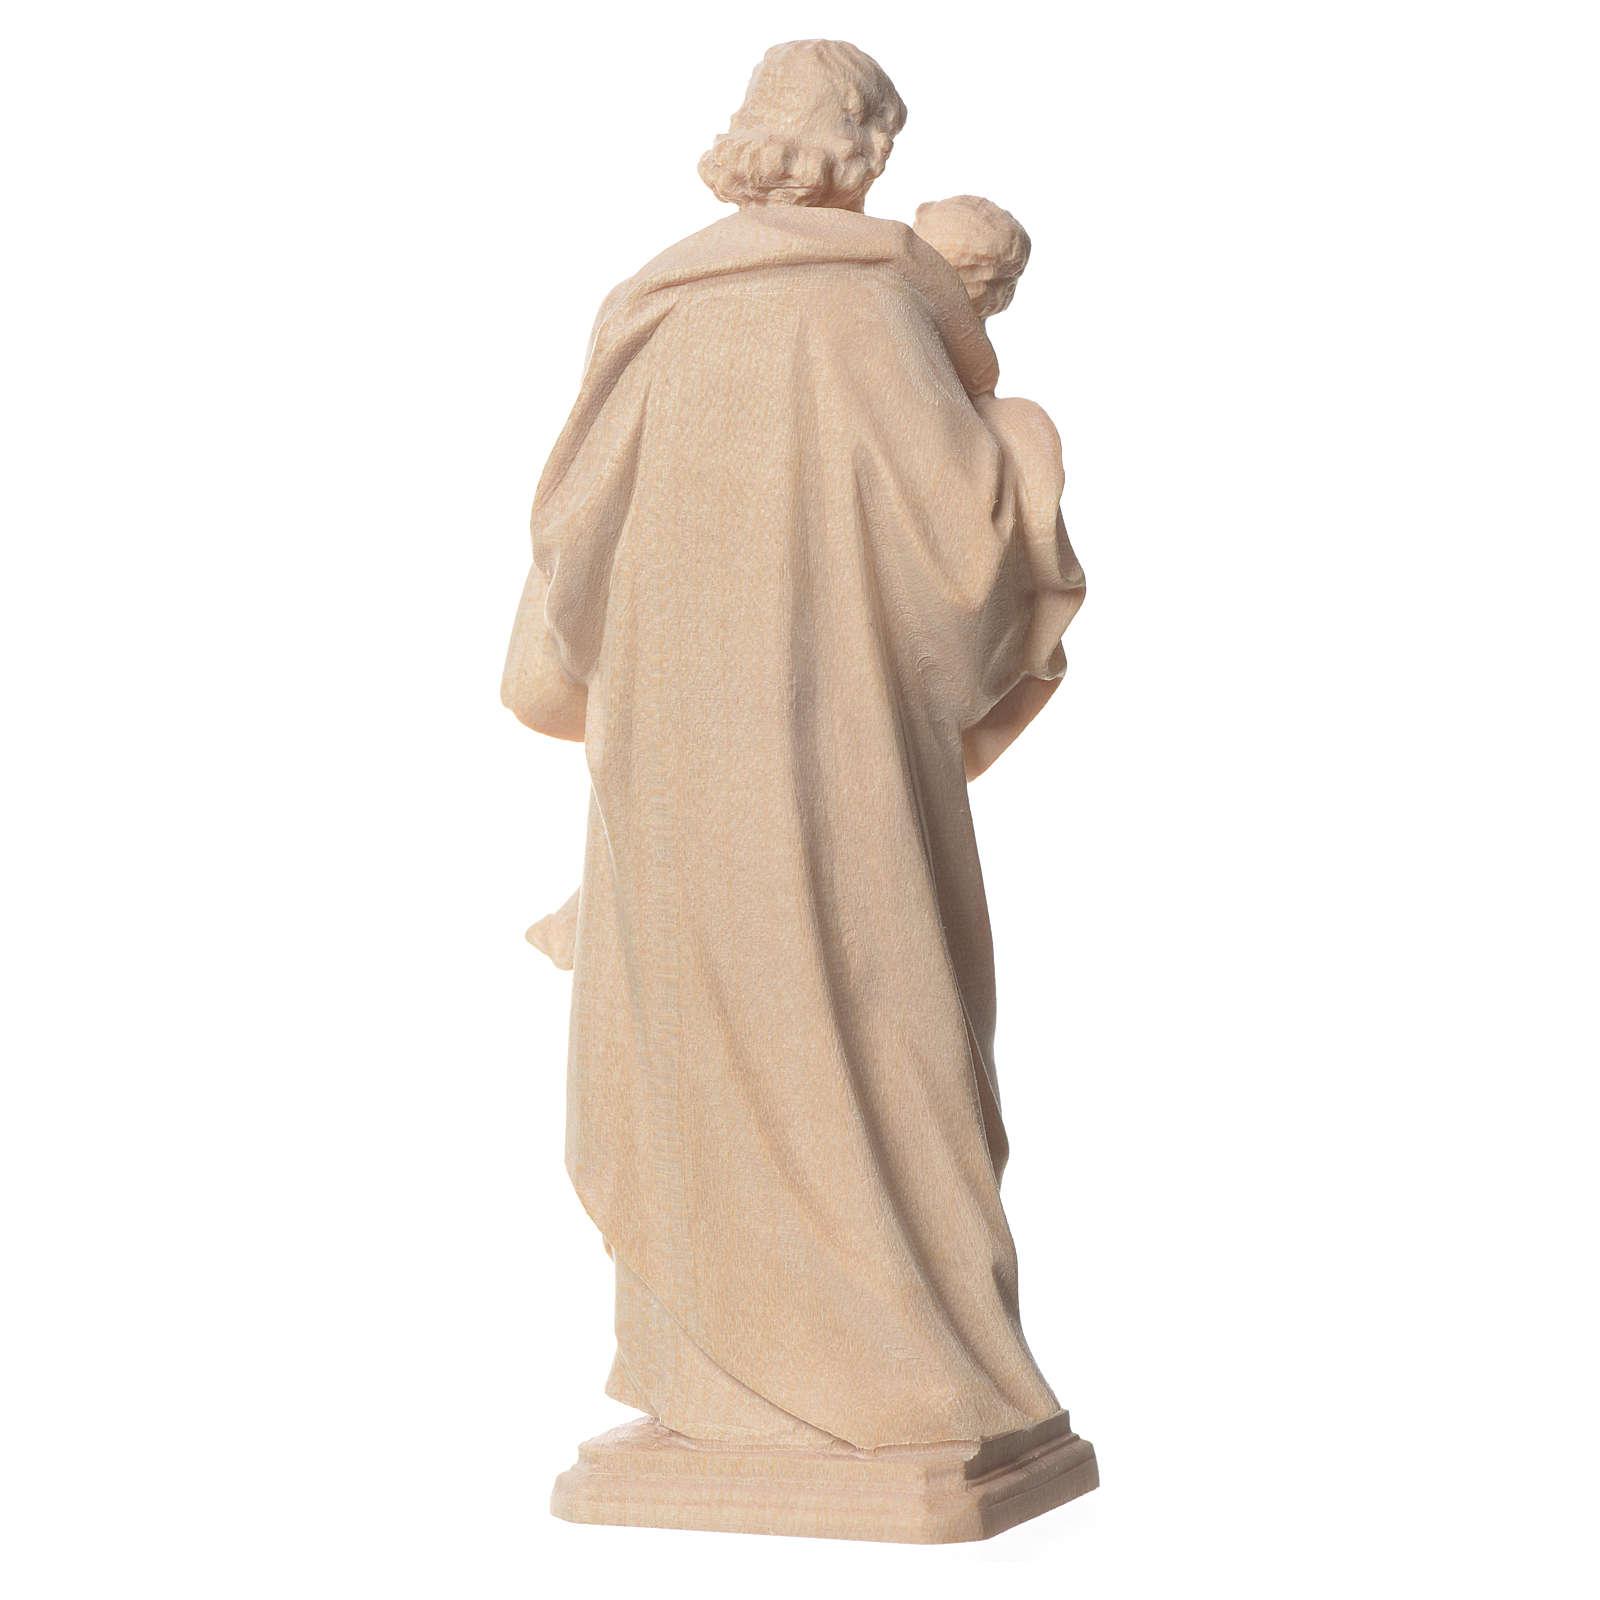 Guido Reni's Saint Joseph in natural Valgardena wood 4